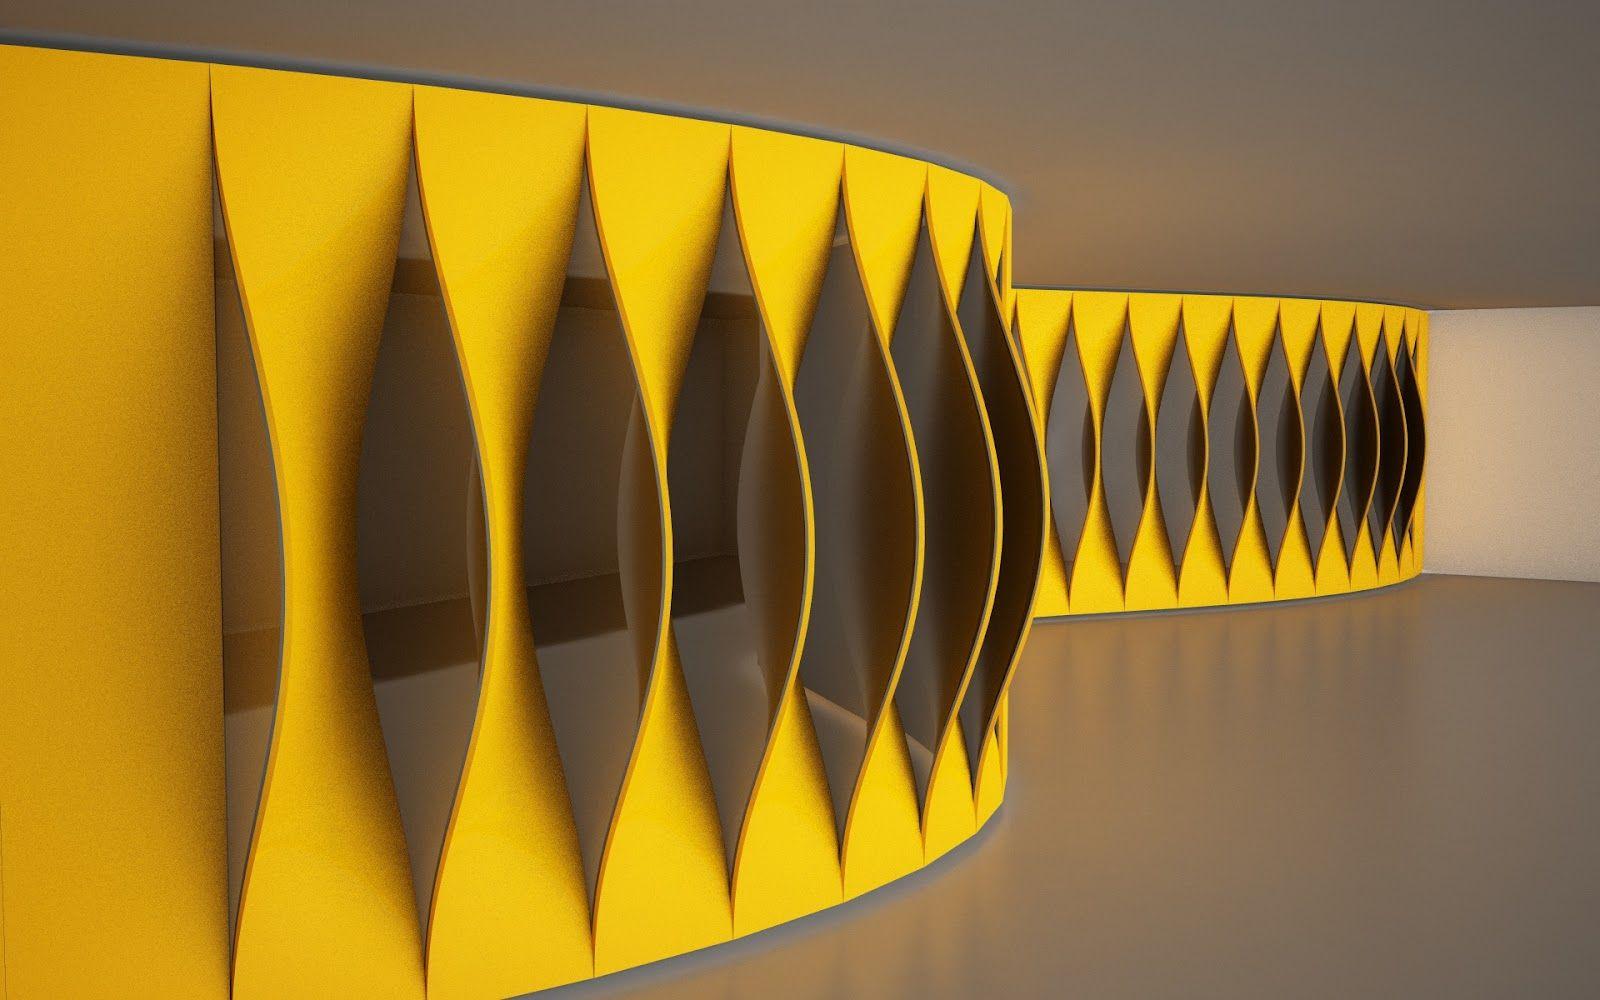 Parametric Wall - Grasshopper | mô hình | Pinterest | Walls ...